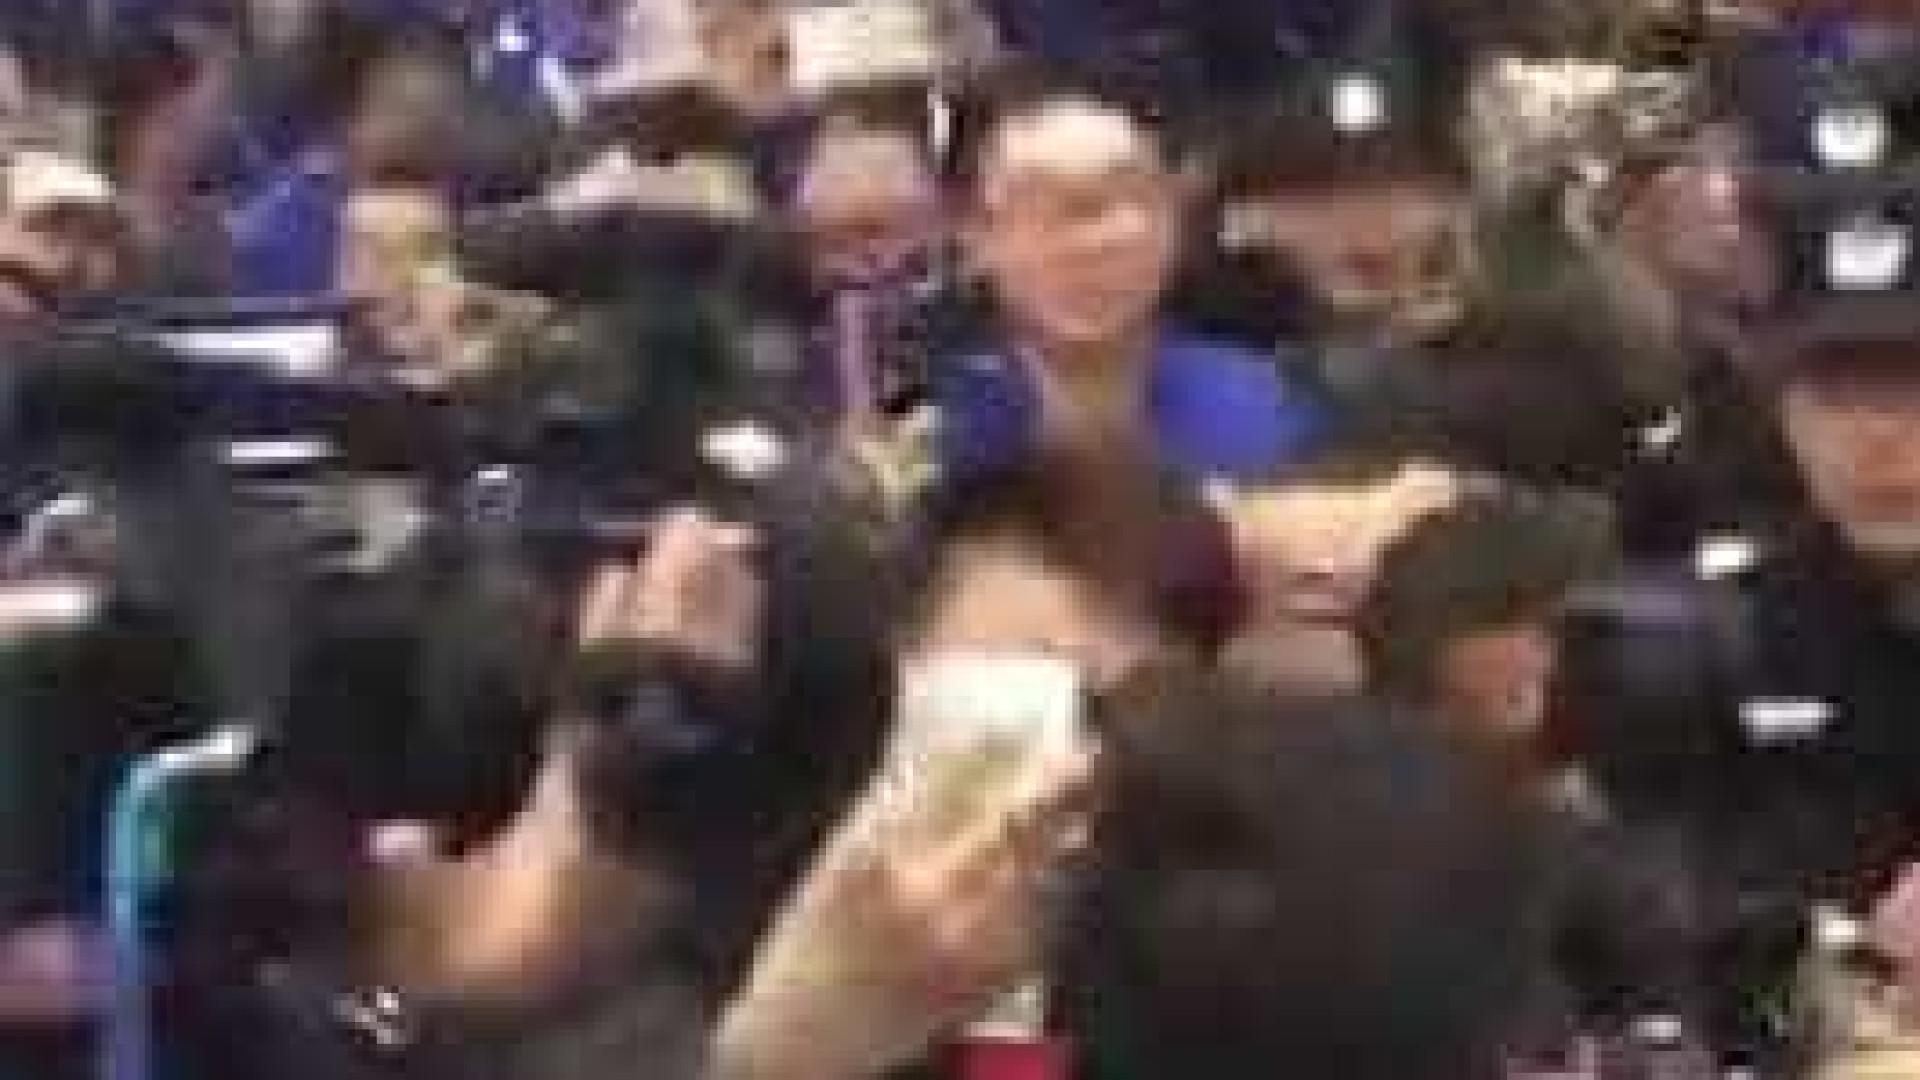 Aeroporto Xangai : Notícias ao minuto aeroporto de xangai virado do avesso